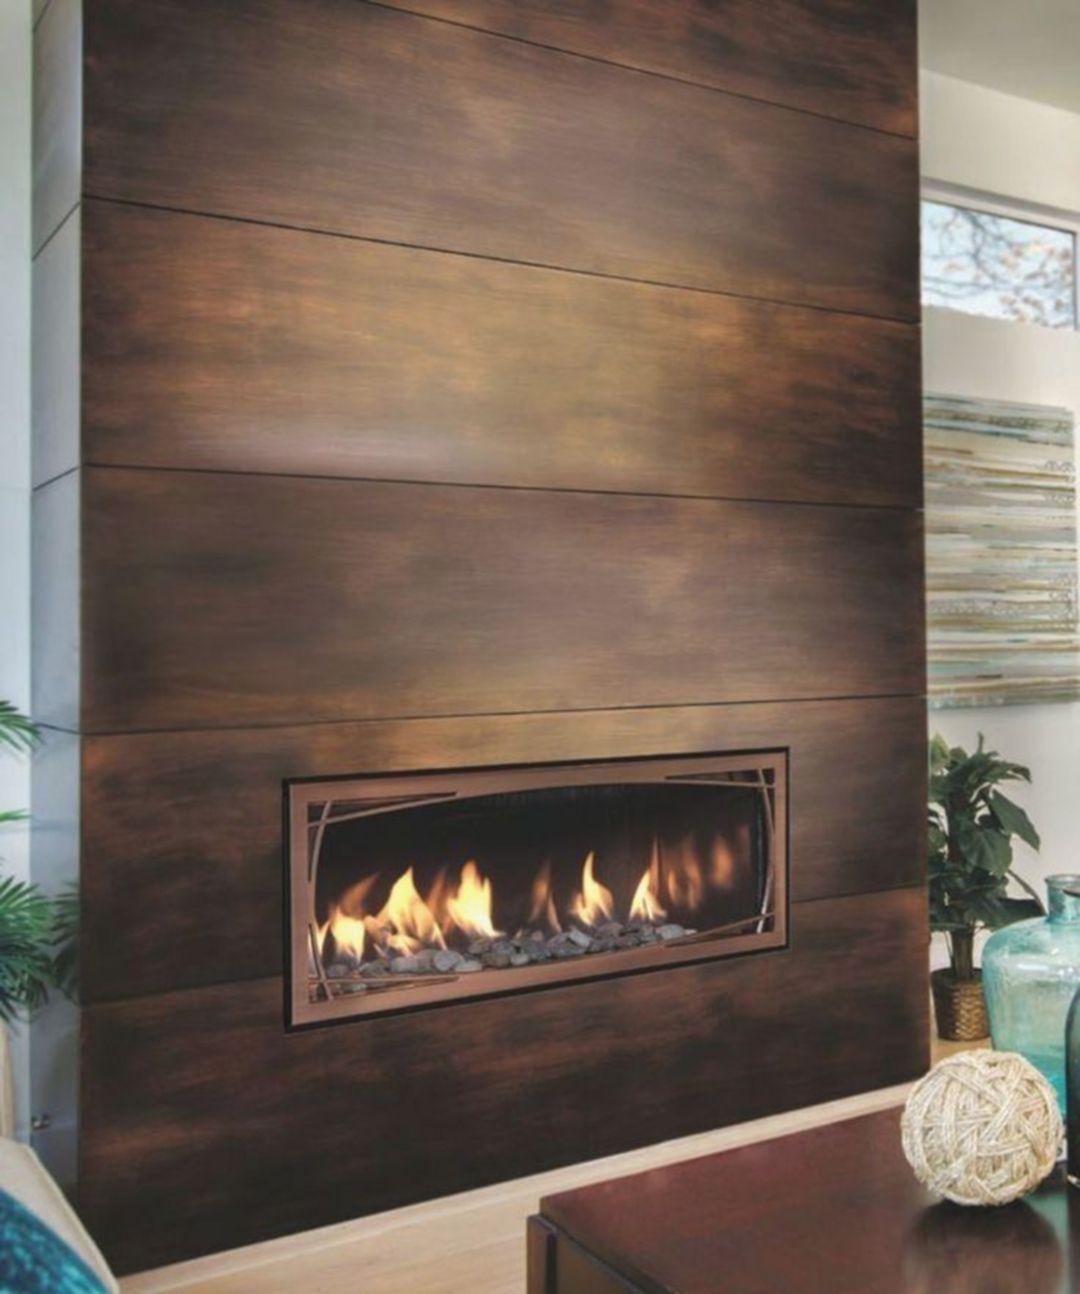 Beautiful Modern Fireplaces Decorating Ideas 20 Contemporary Fireplace Modern Fireplace Fireplace Design